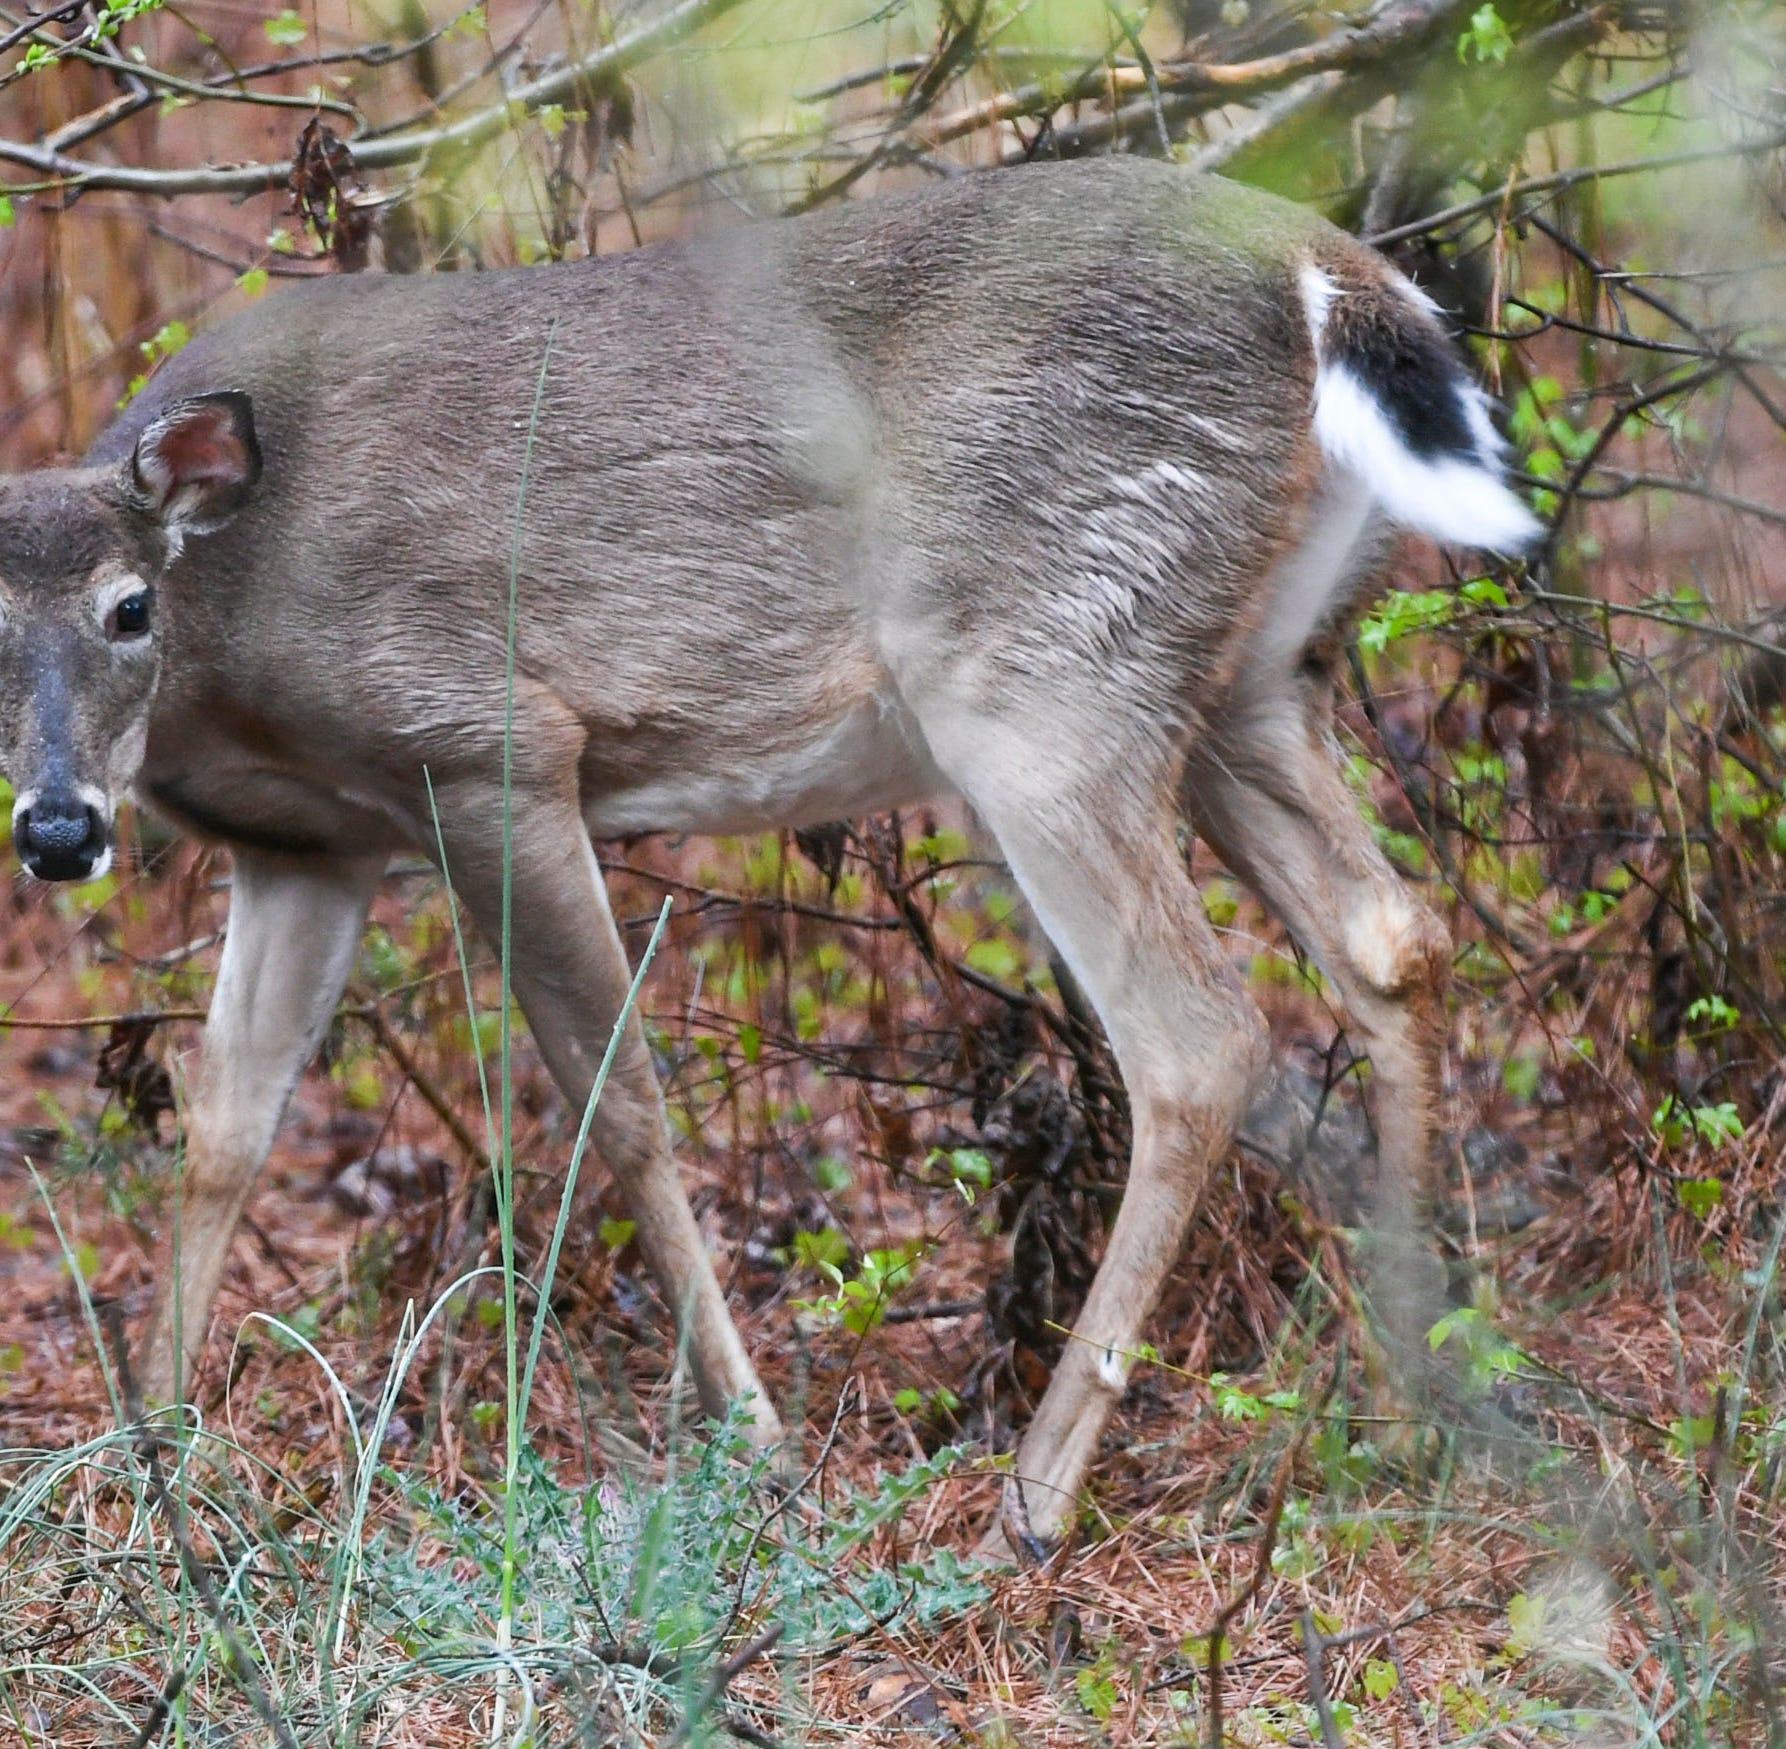 Deer harvest report up for hunters in 2018